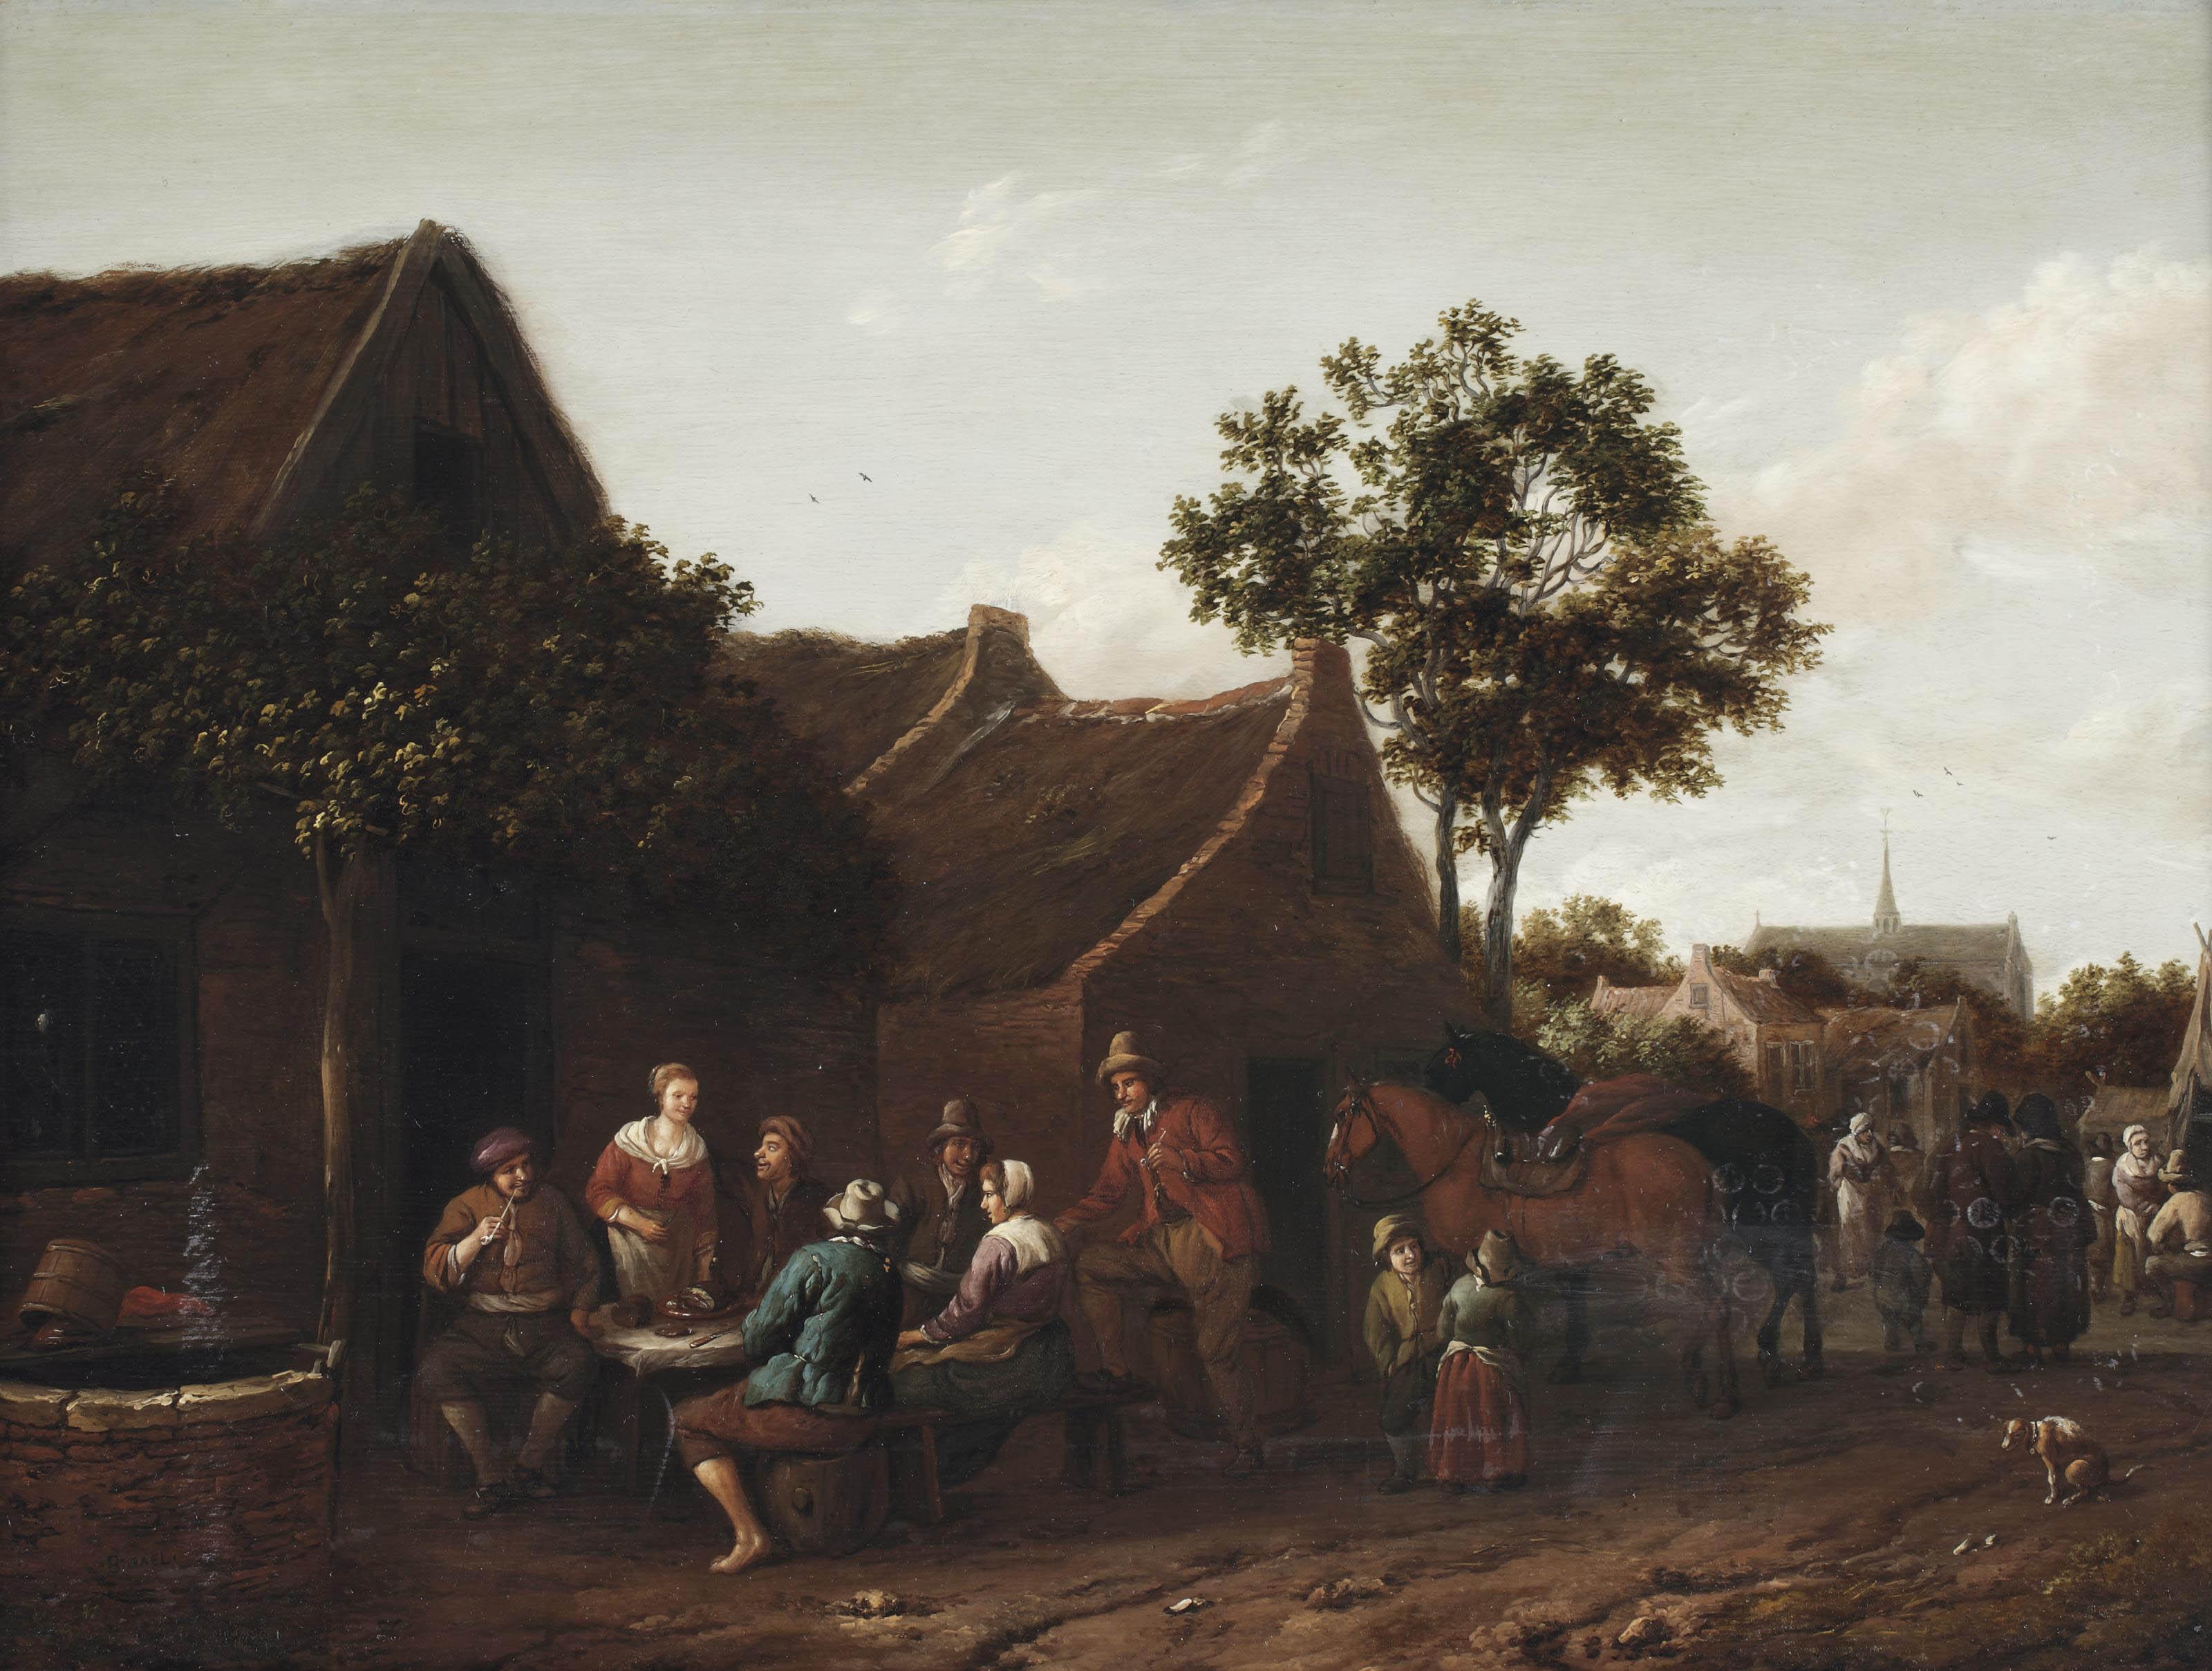 Peasants making merry outside an inn